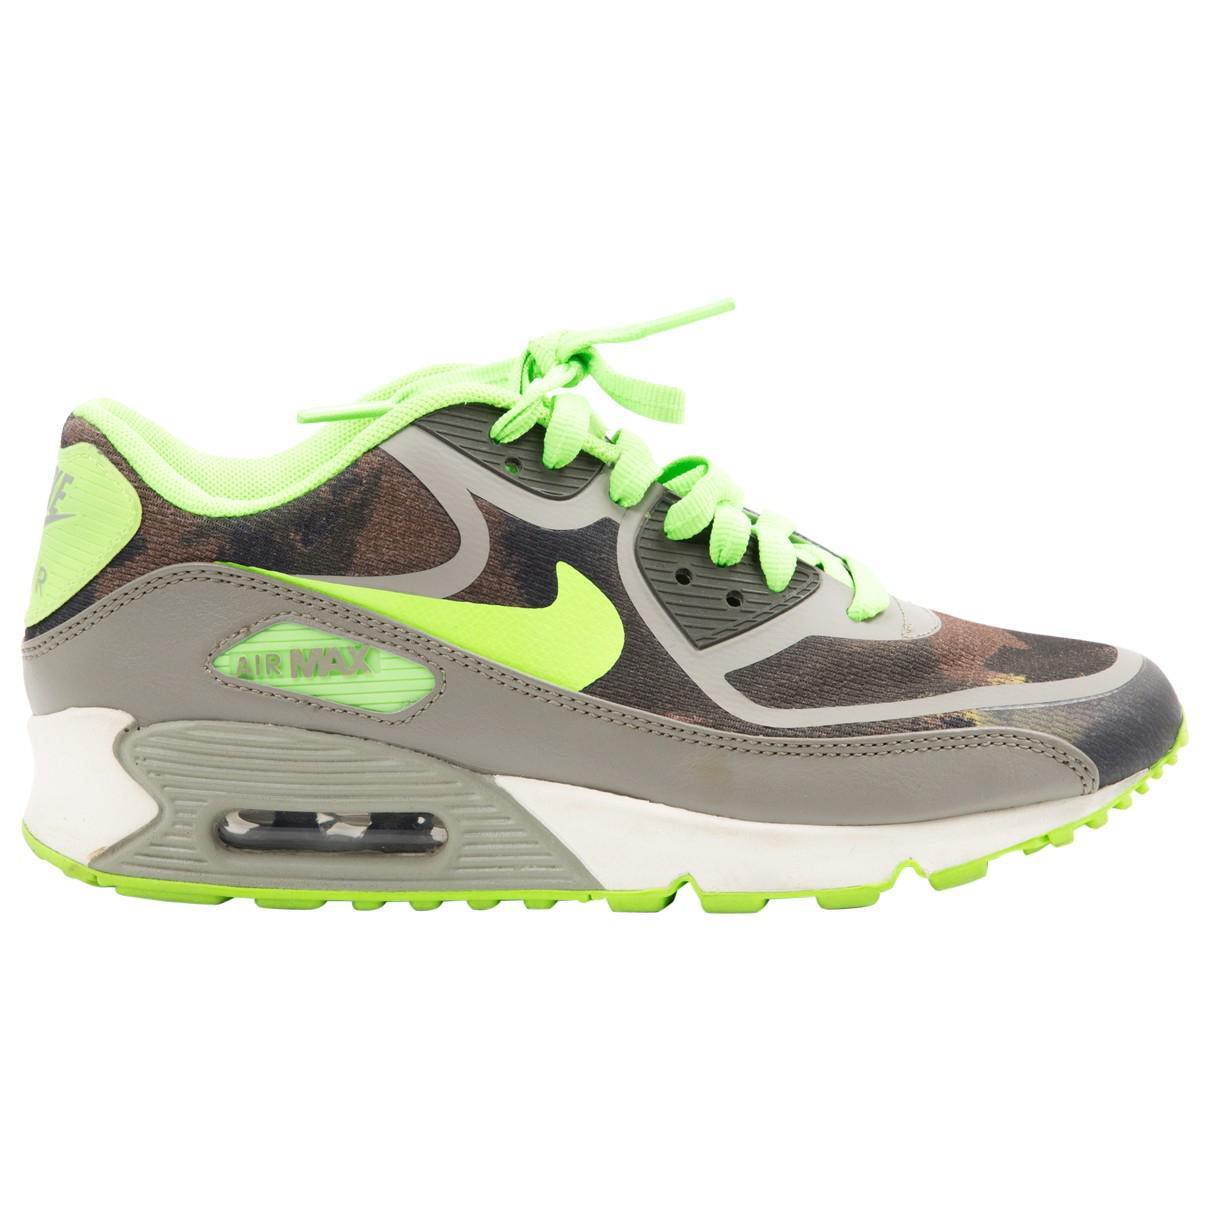 Occasion - Formateurs En Tissu Air Max Nike m5cYvHJ